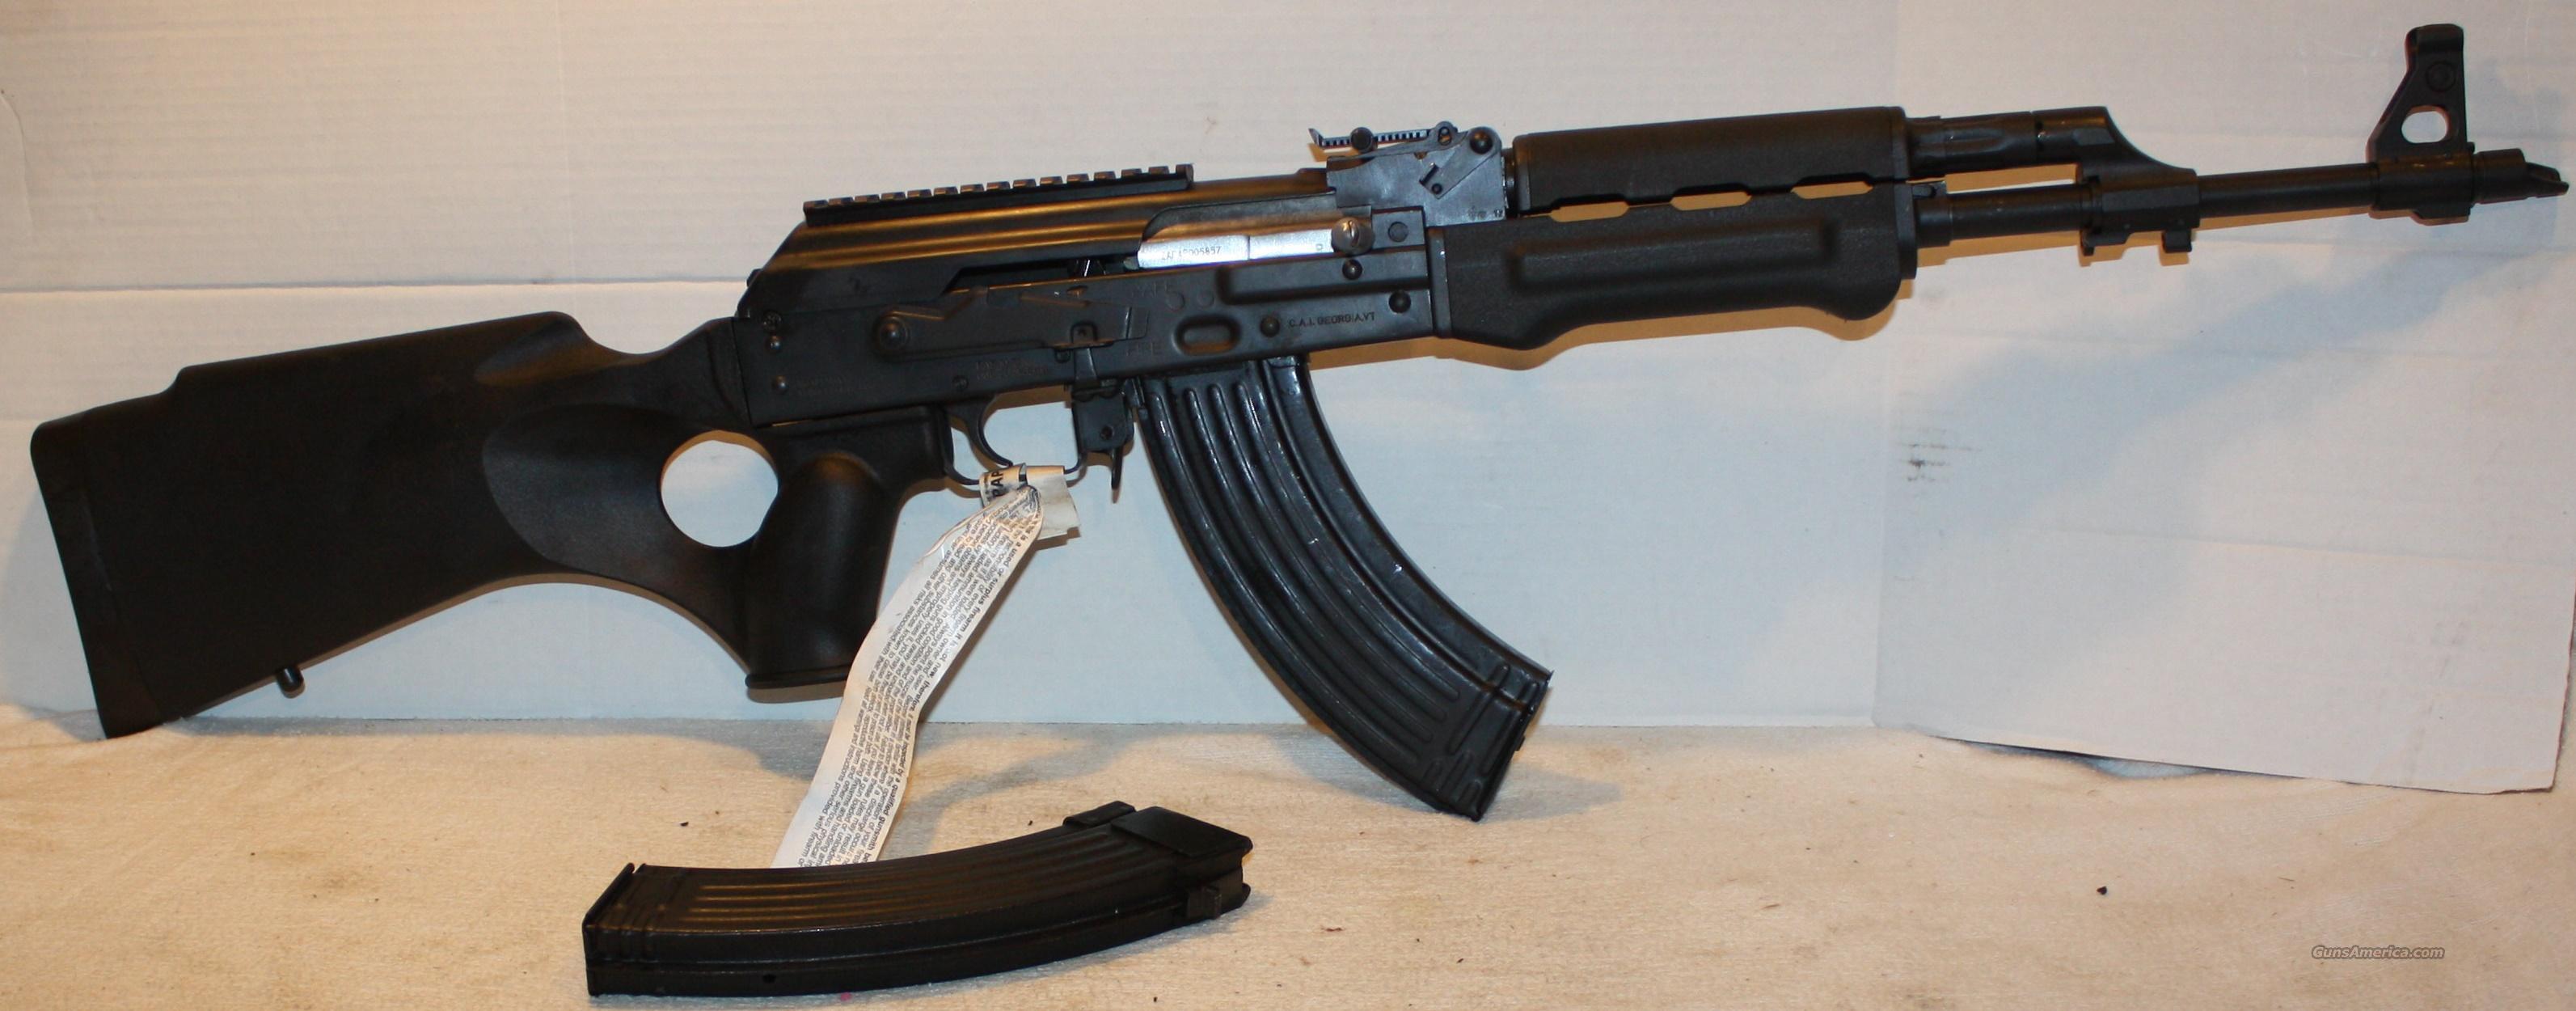 Zastava N-PAP HI-CAP Semi-Auto Rifle With Thumbhole Stock & Polymer  Handguard, Picatinny Scope Mount, Caliber 7 62x39mm